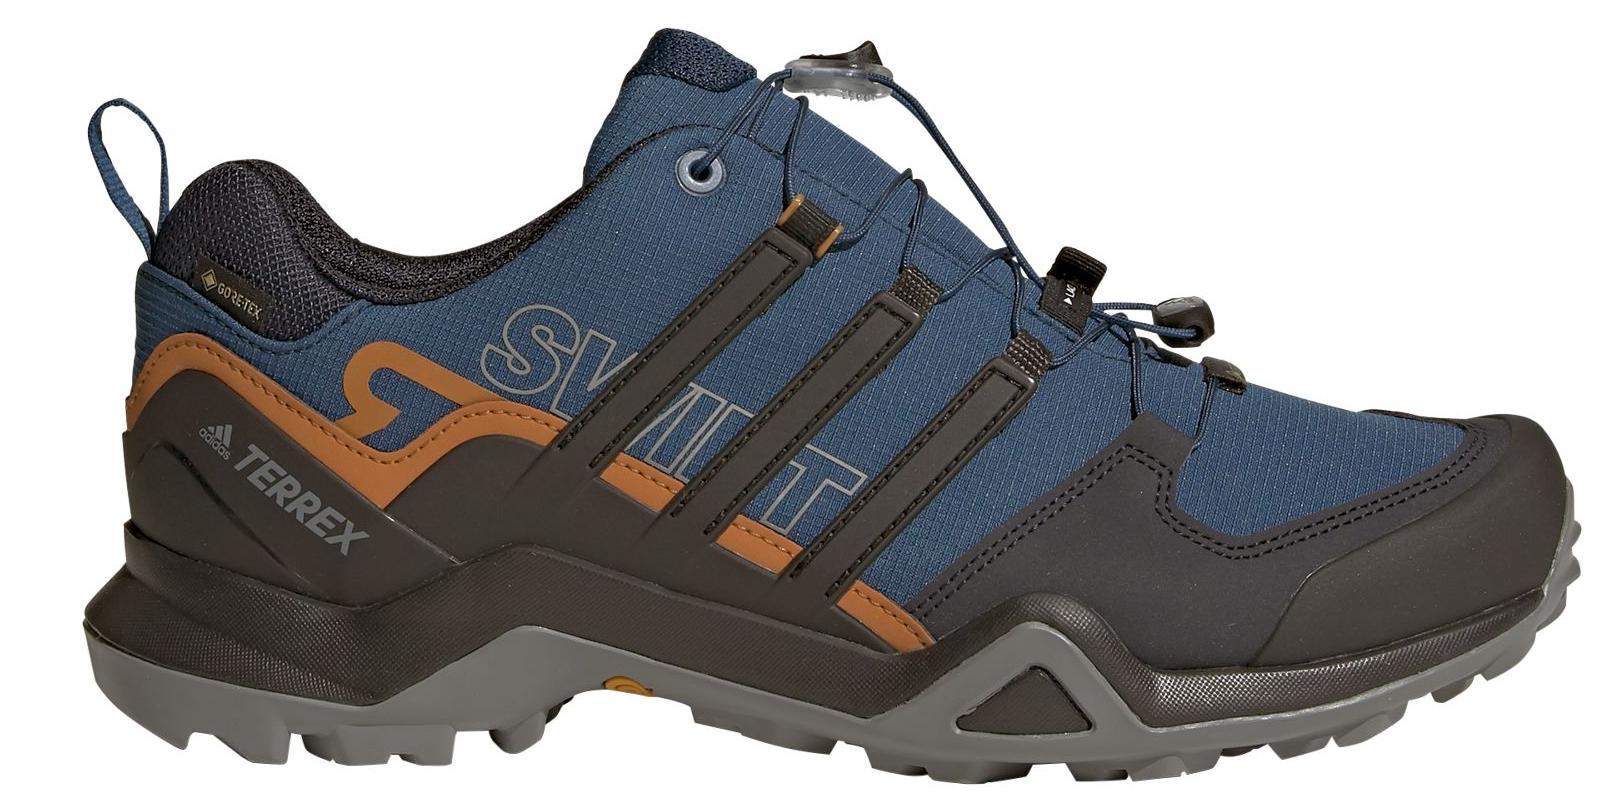 Adidas Herren Terrex Swift R2 GTX Wanderhalbschuh im Biwak